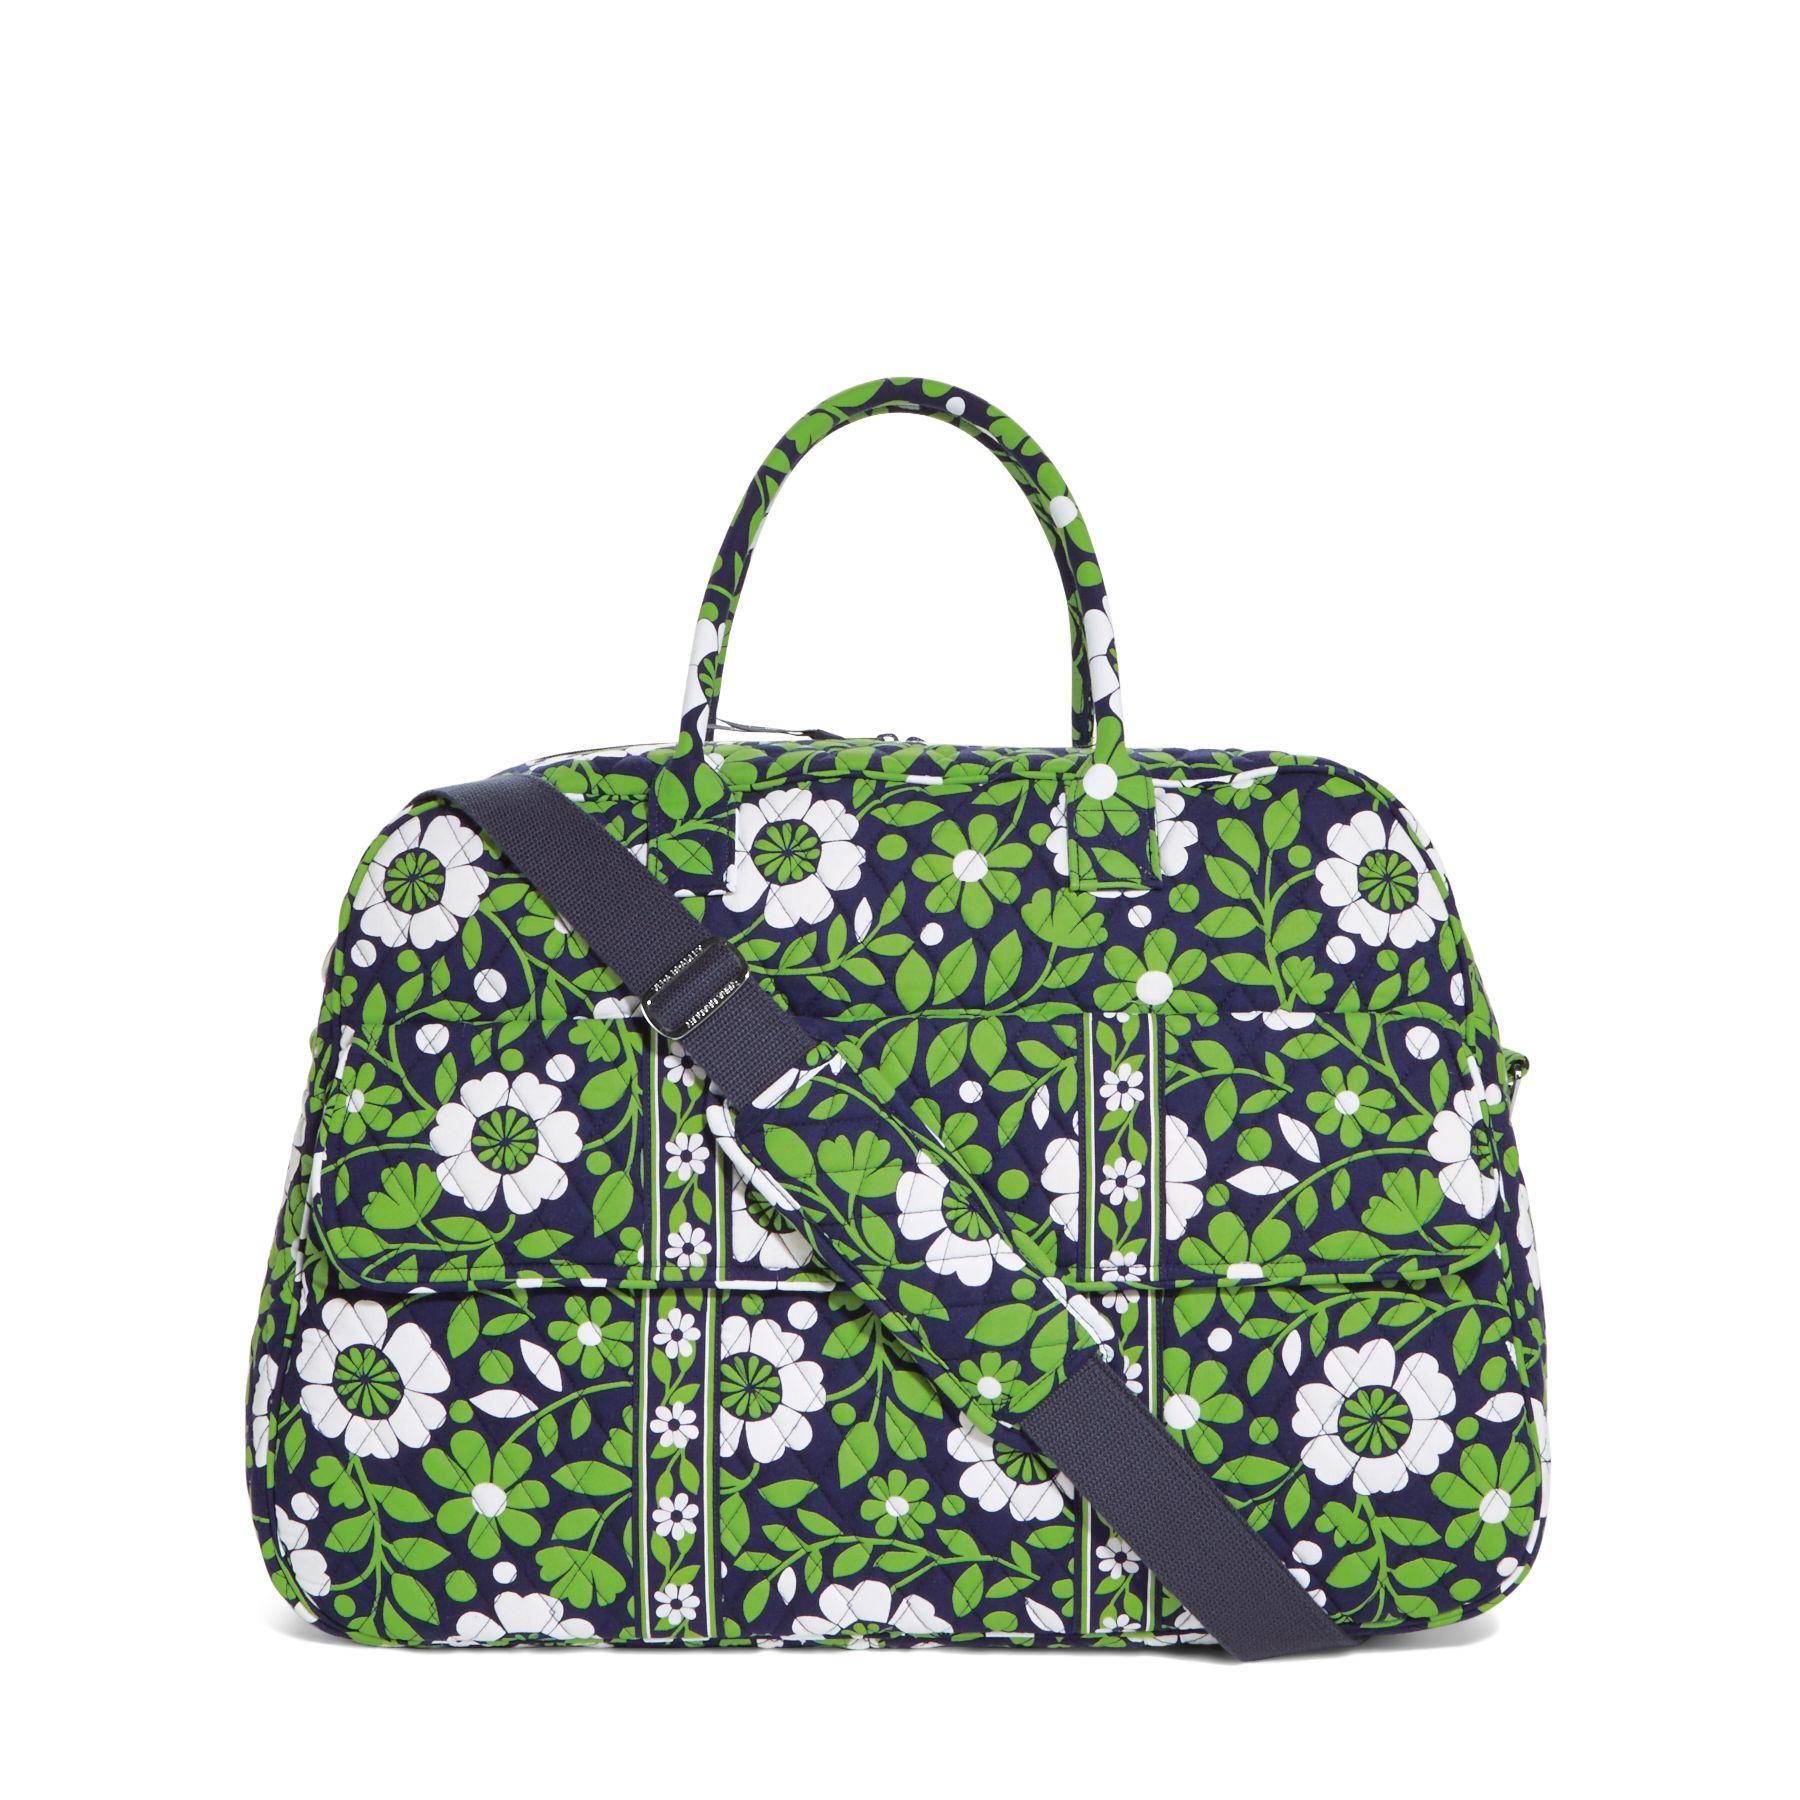 Vera Bradley Grand Traveler Bag in Lucky You